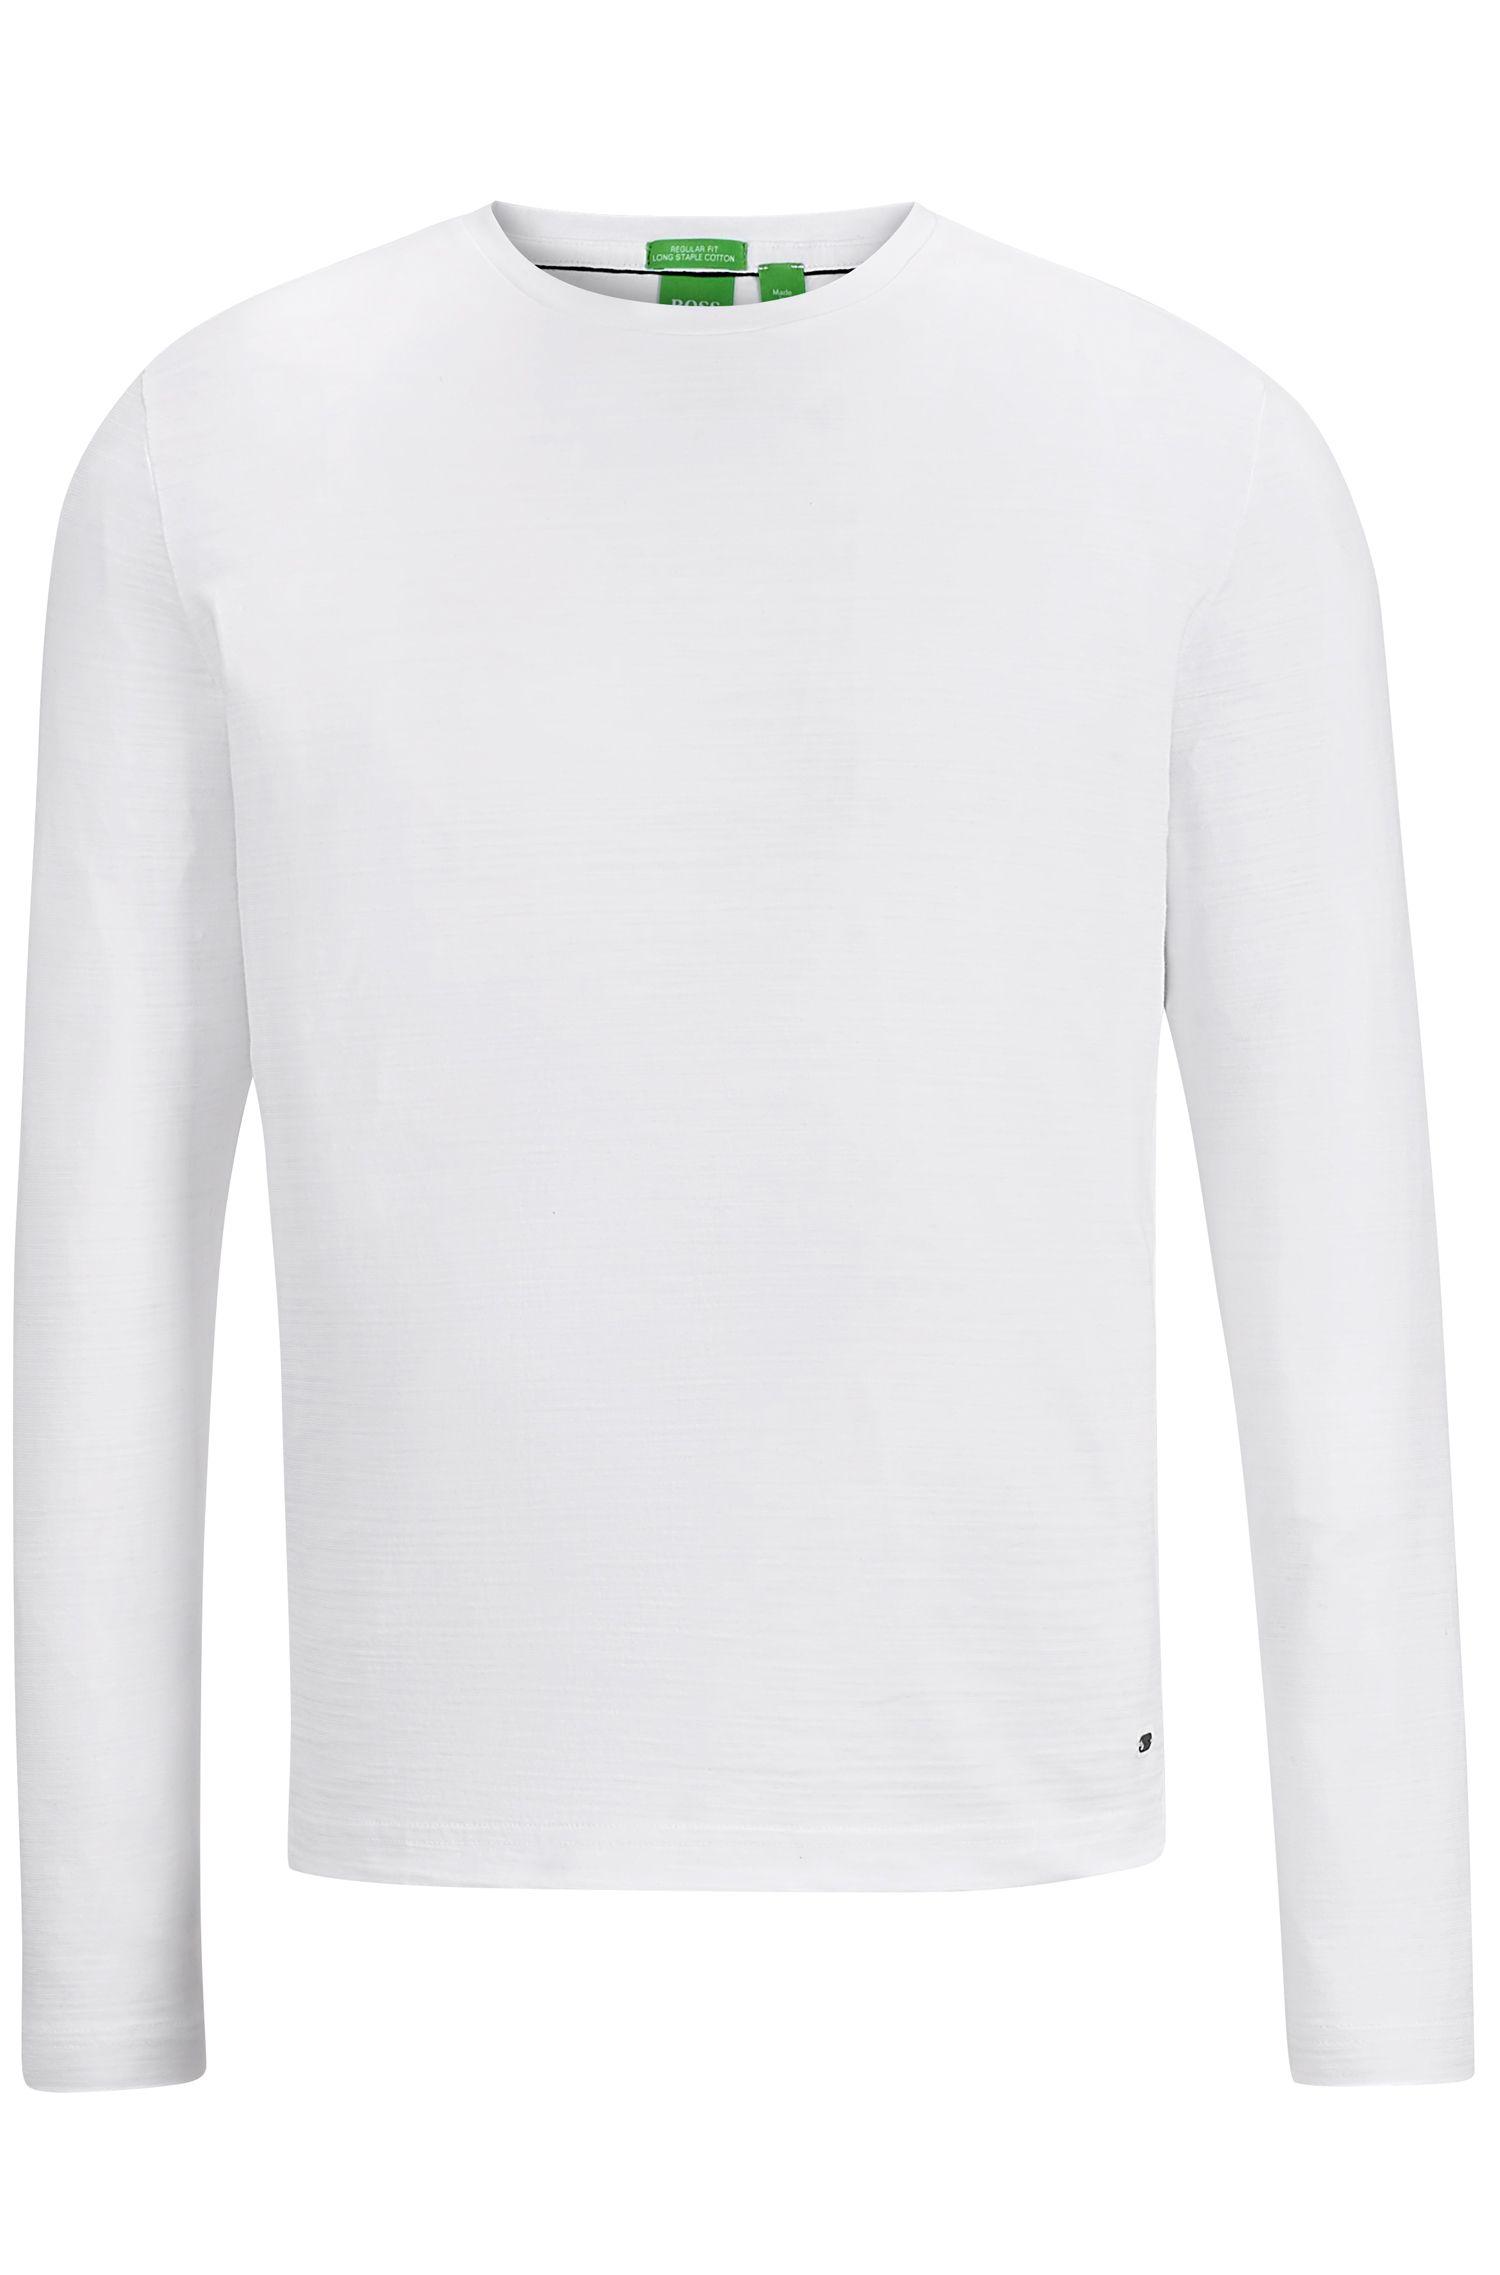 Cotton Long Sleeve T-Shirt | Sessari US